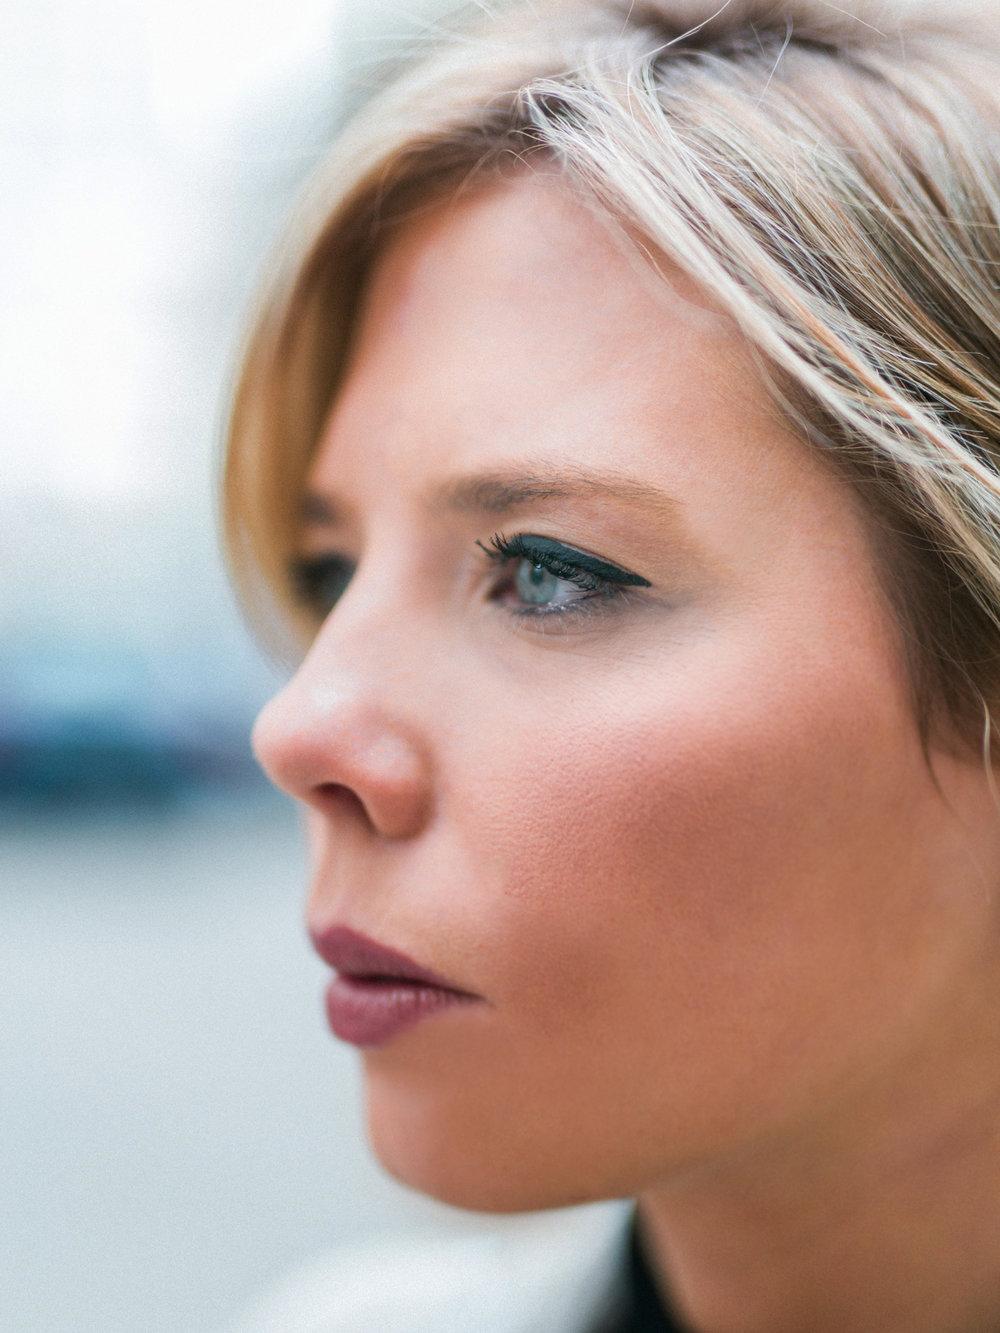 DanielleGirouxPhotography_Toronto_Portrait_StreetPhotography_0C6A1168.jpg